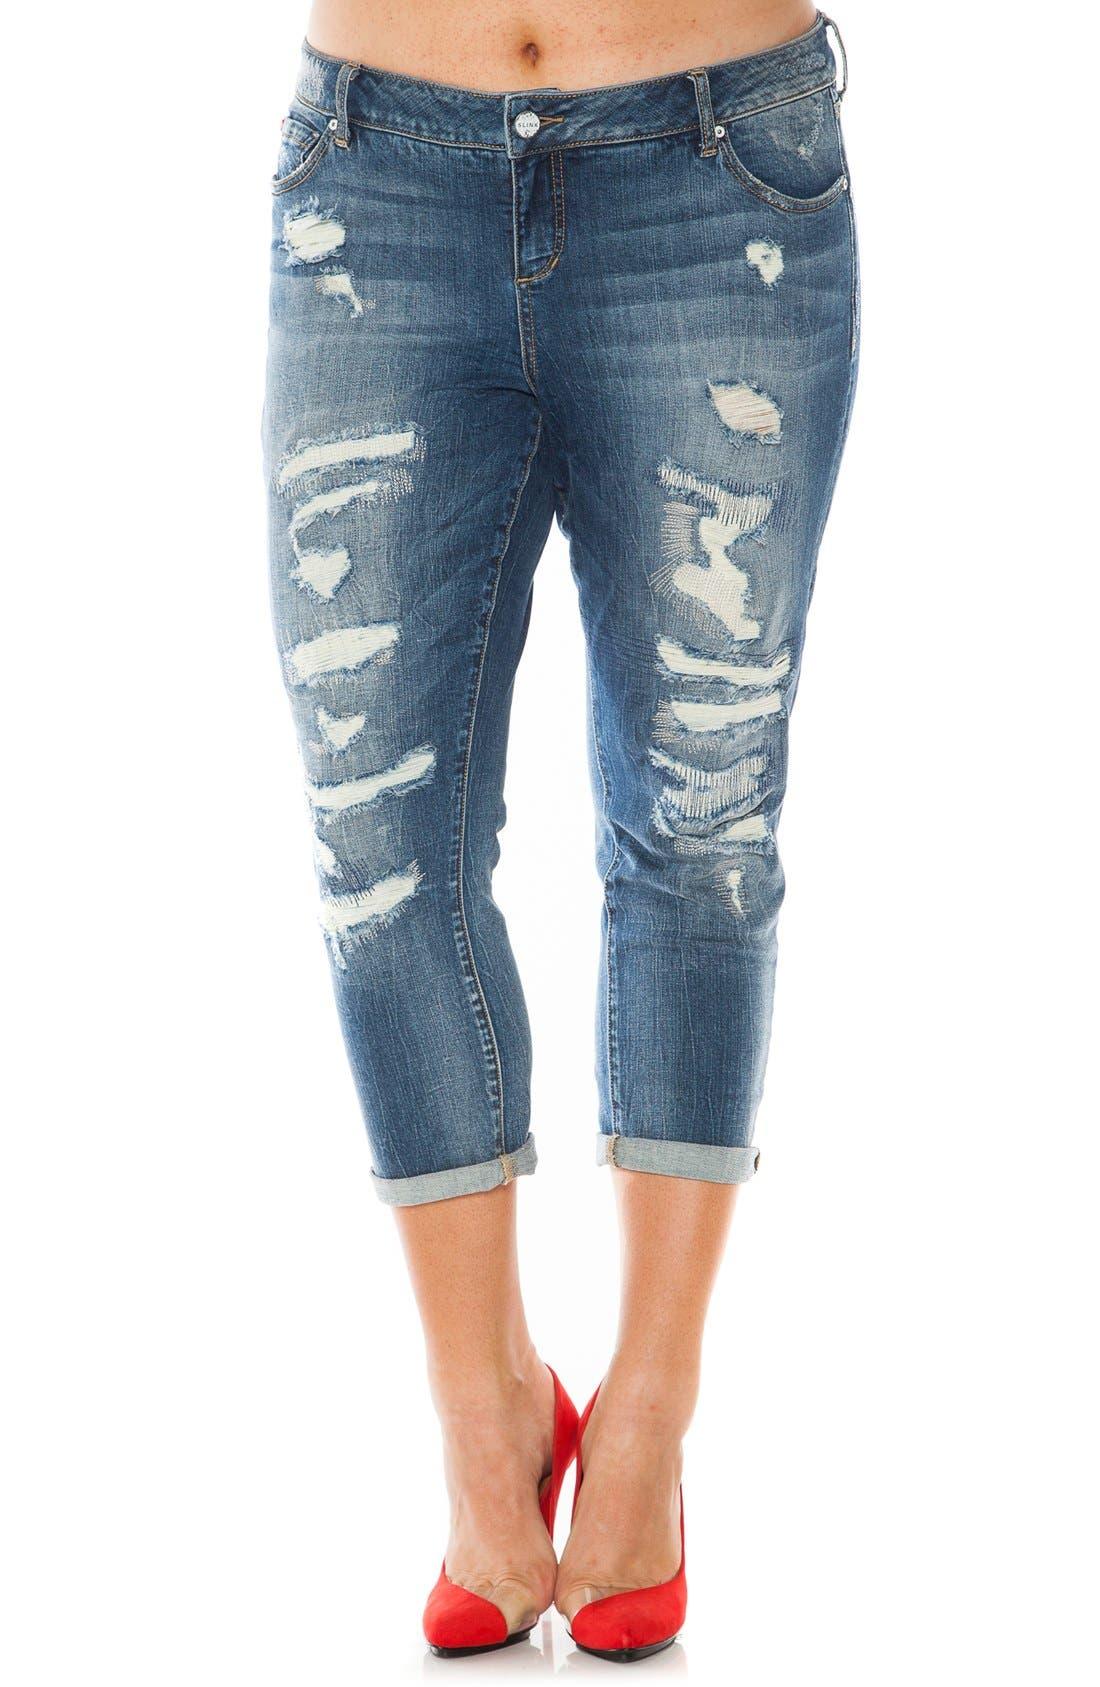 SLINK JEANS Distressed Roll Cuff Stretch Boyfriend Jeans